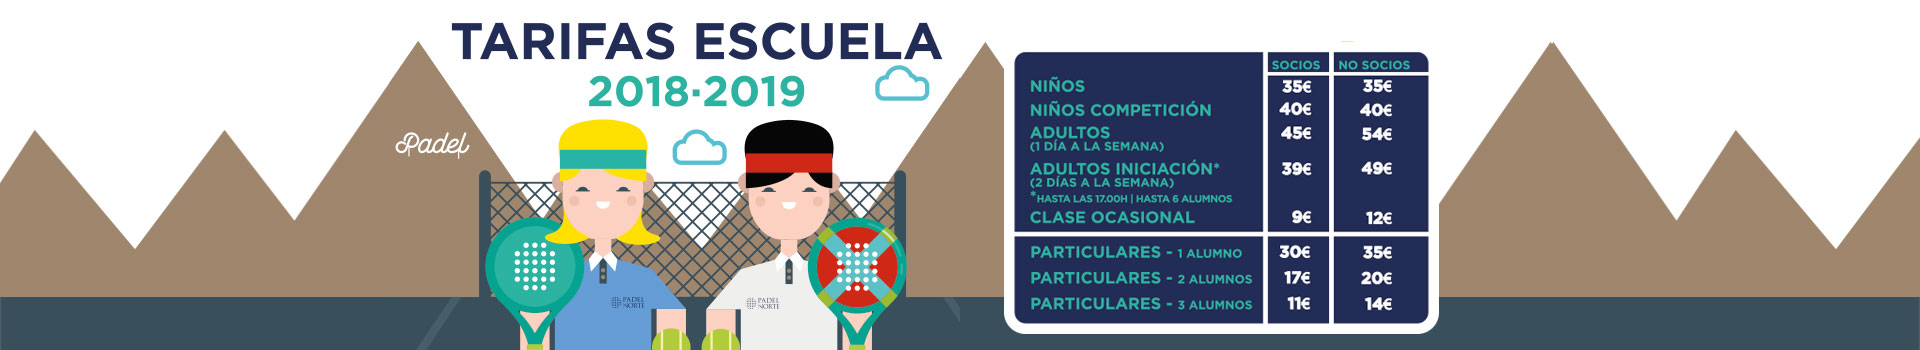 2018-Tarifas-Escuela-2018